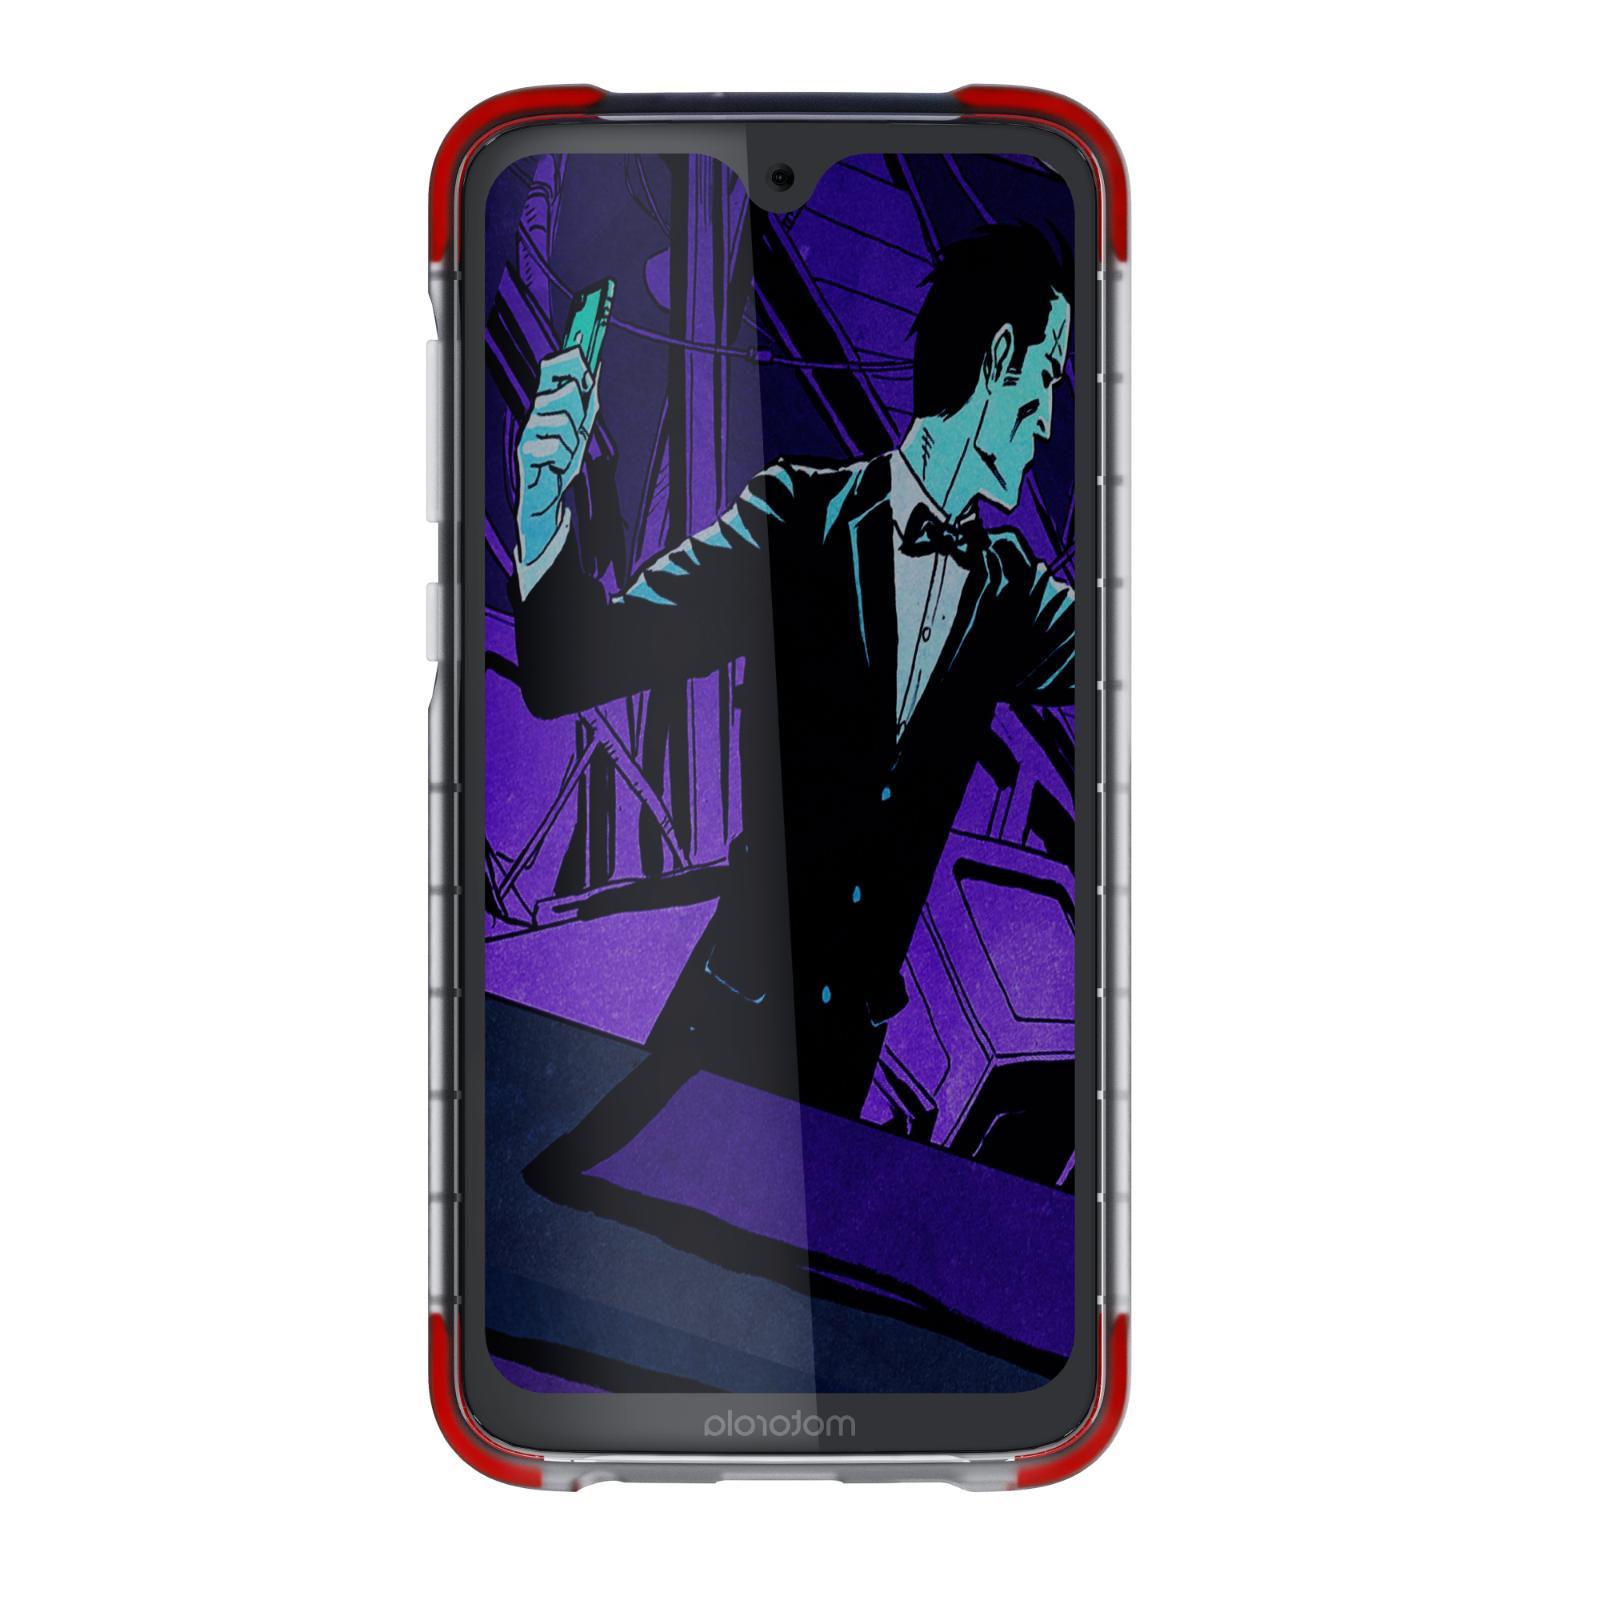 Clear / Plus, Moto Play, Moto Power Supra Case Ghostek 3